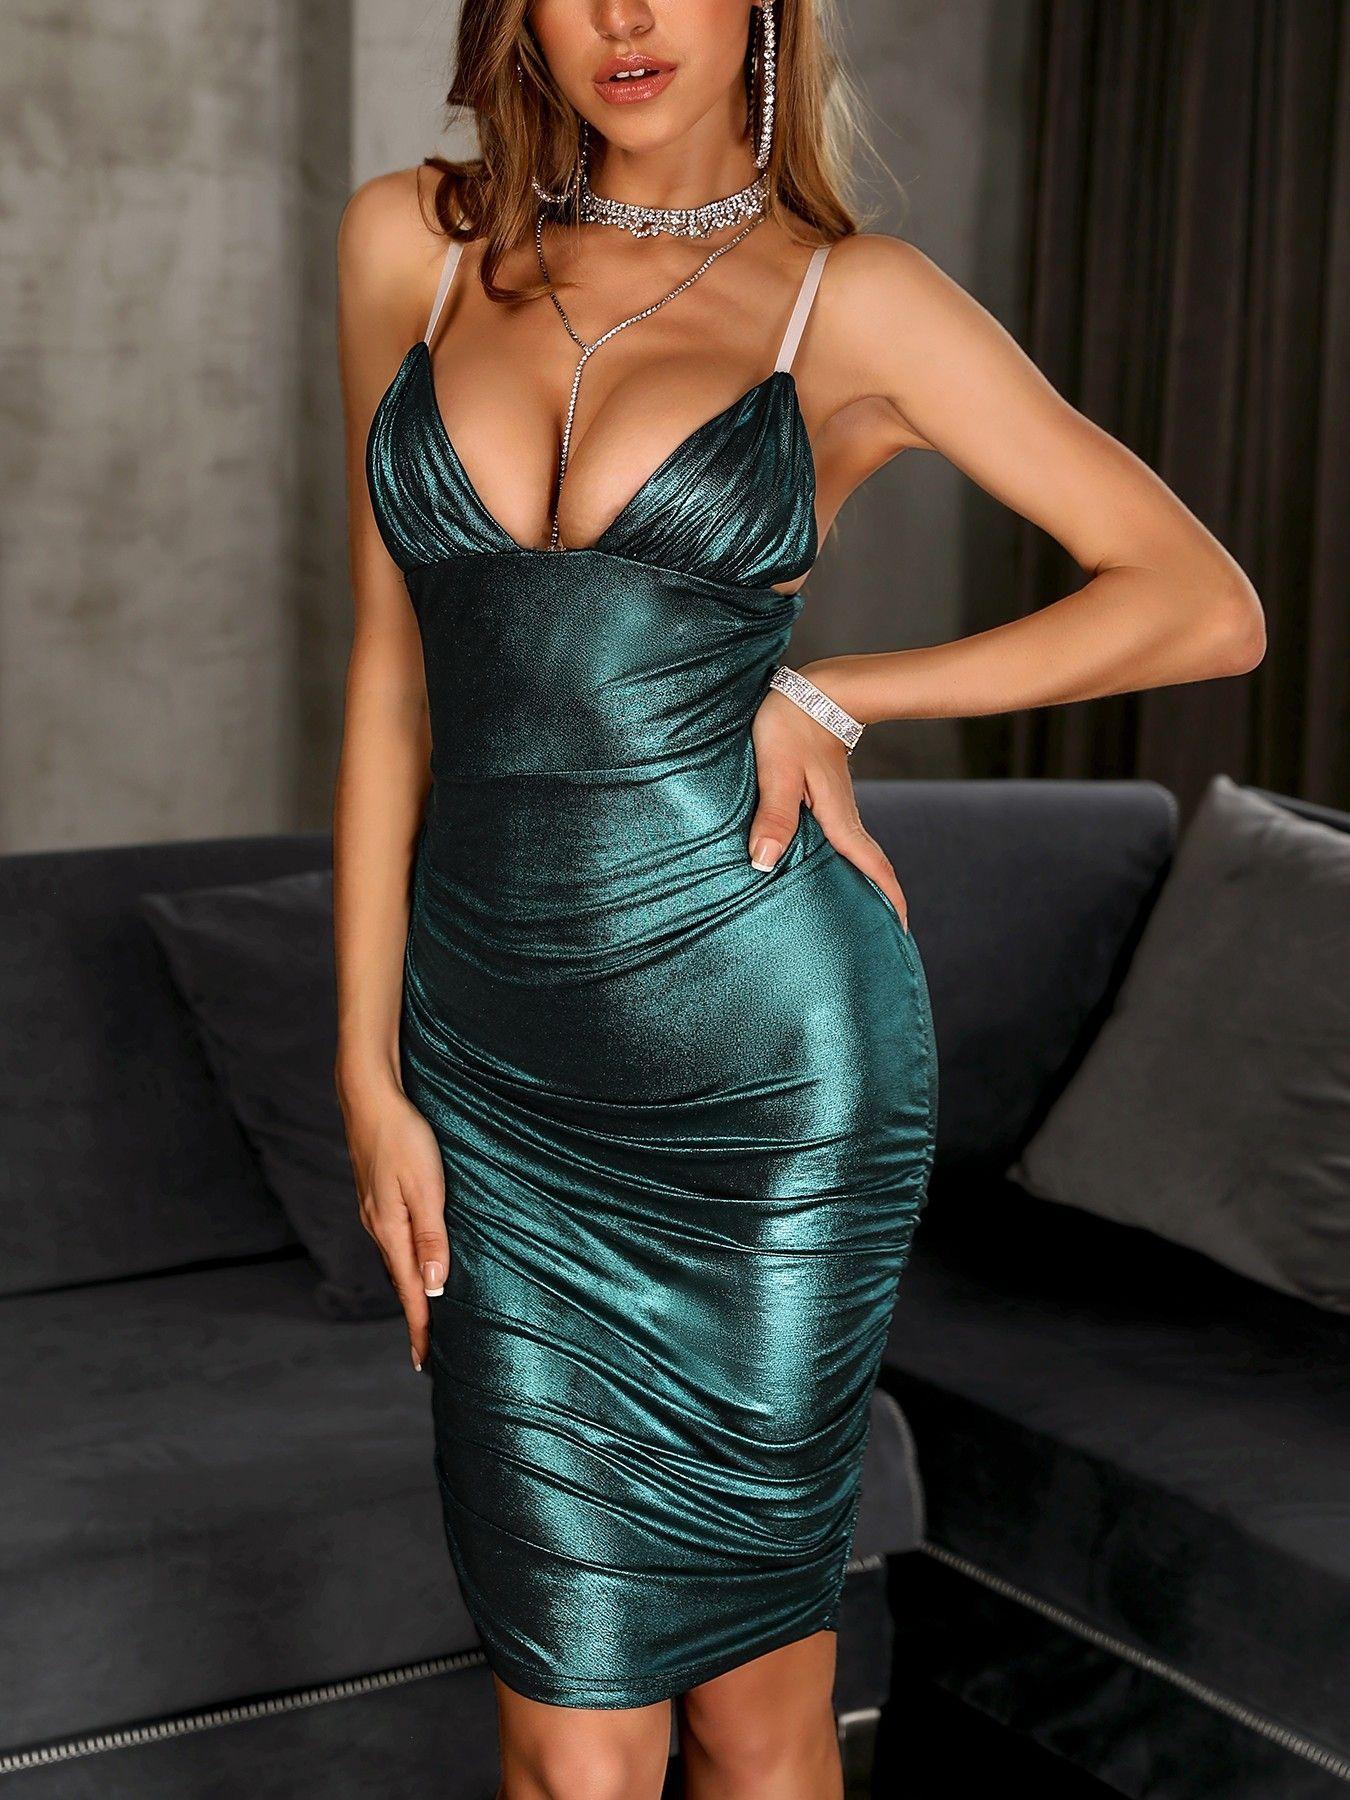 78a0191a629 ... sexy women fashion at Boutiquefeel. Glitter Spaghetti Strap Ruched  Design Dress (S M L XL)  29.99